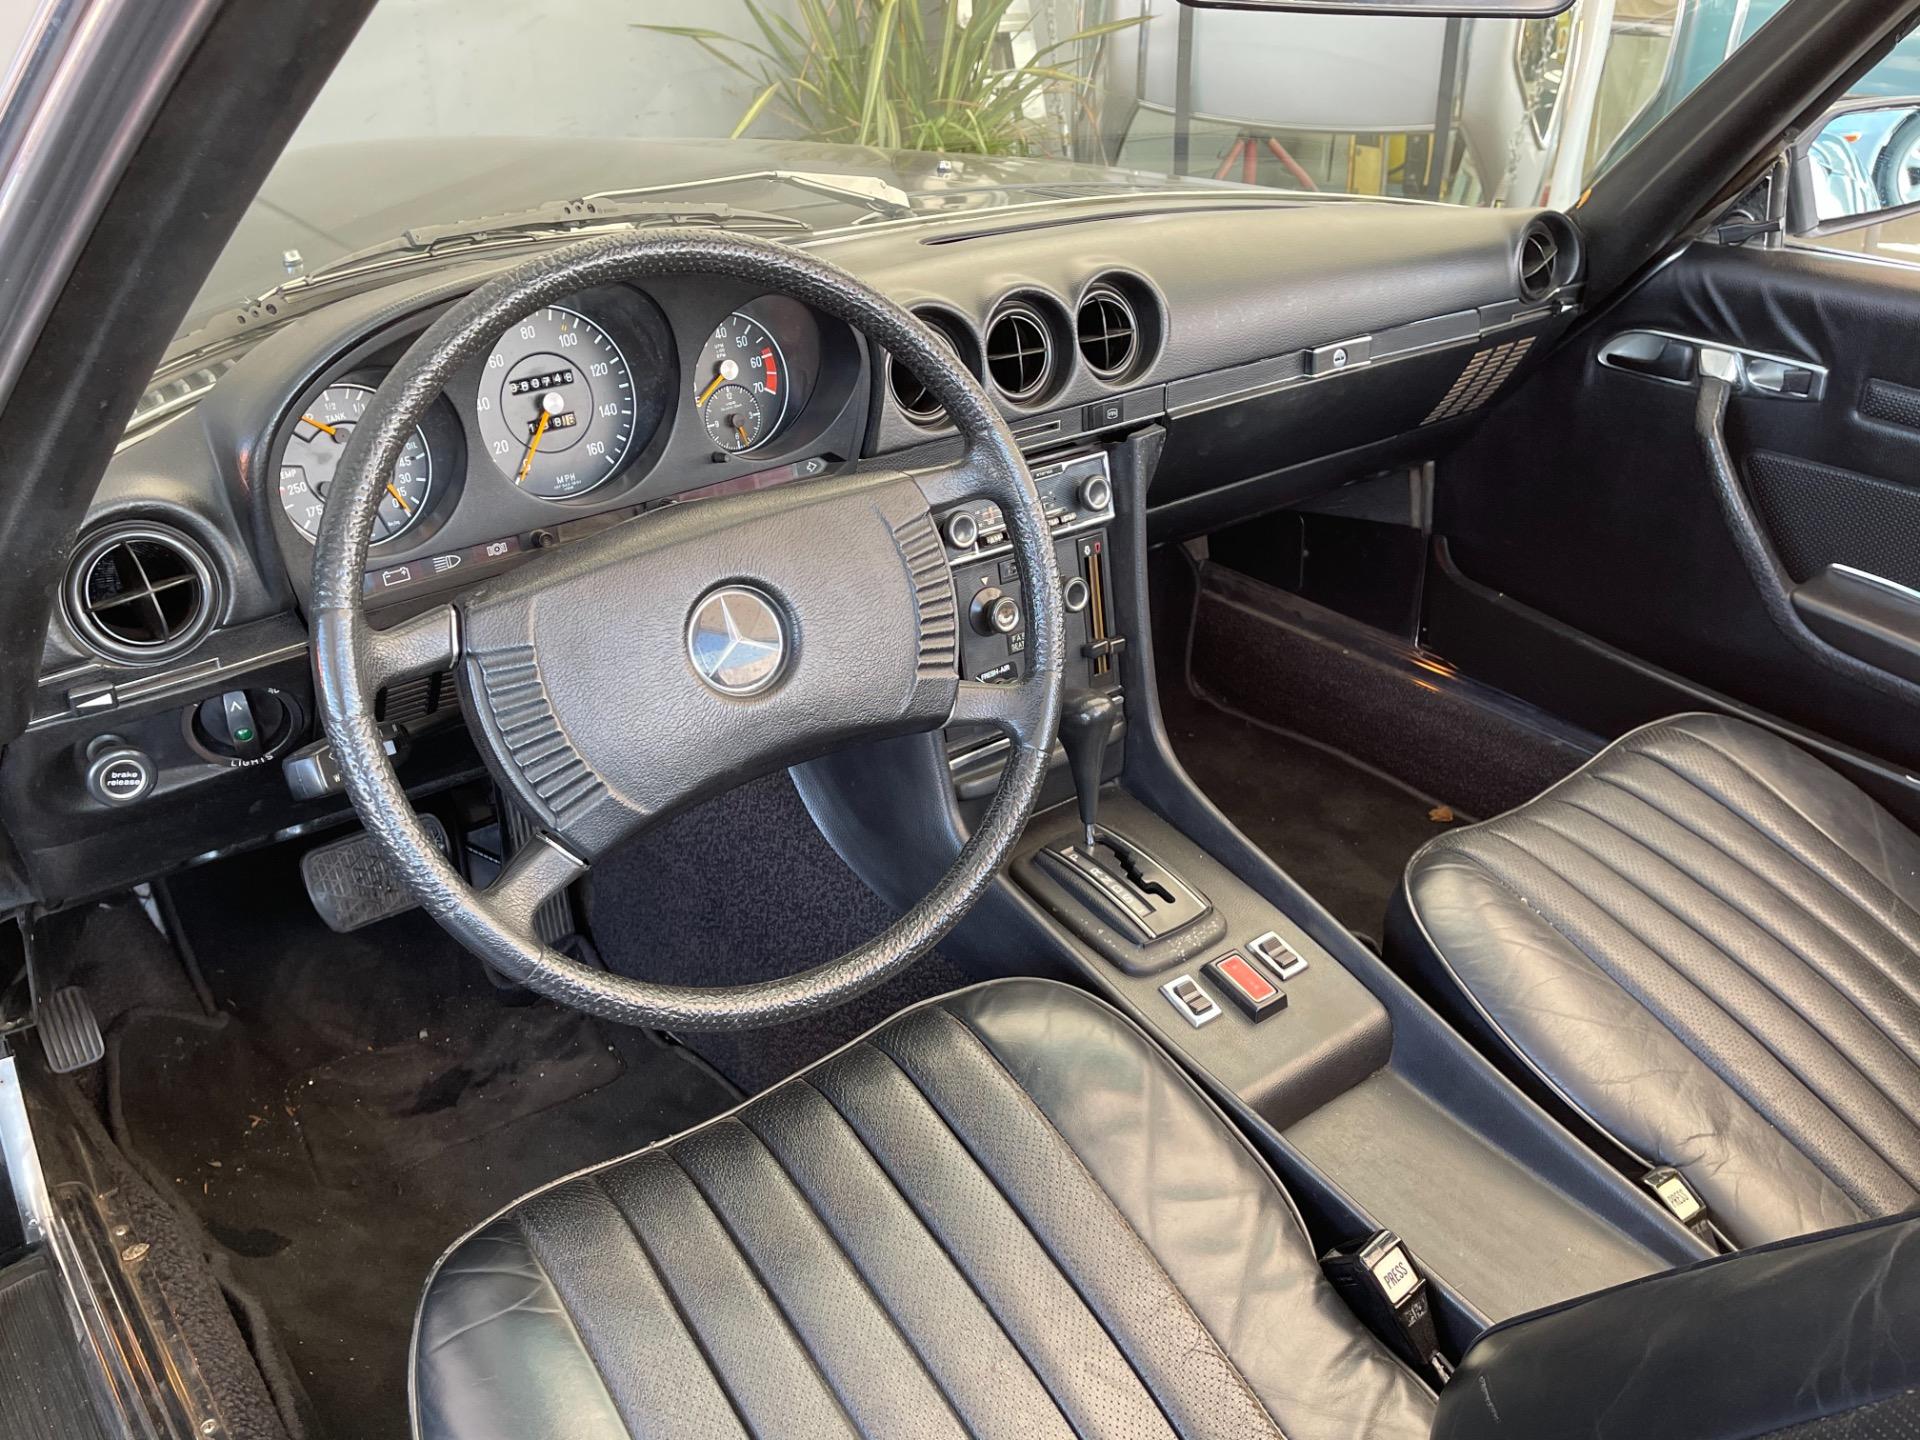 Used 1974 MERCEDES BENZ 450SL